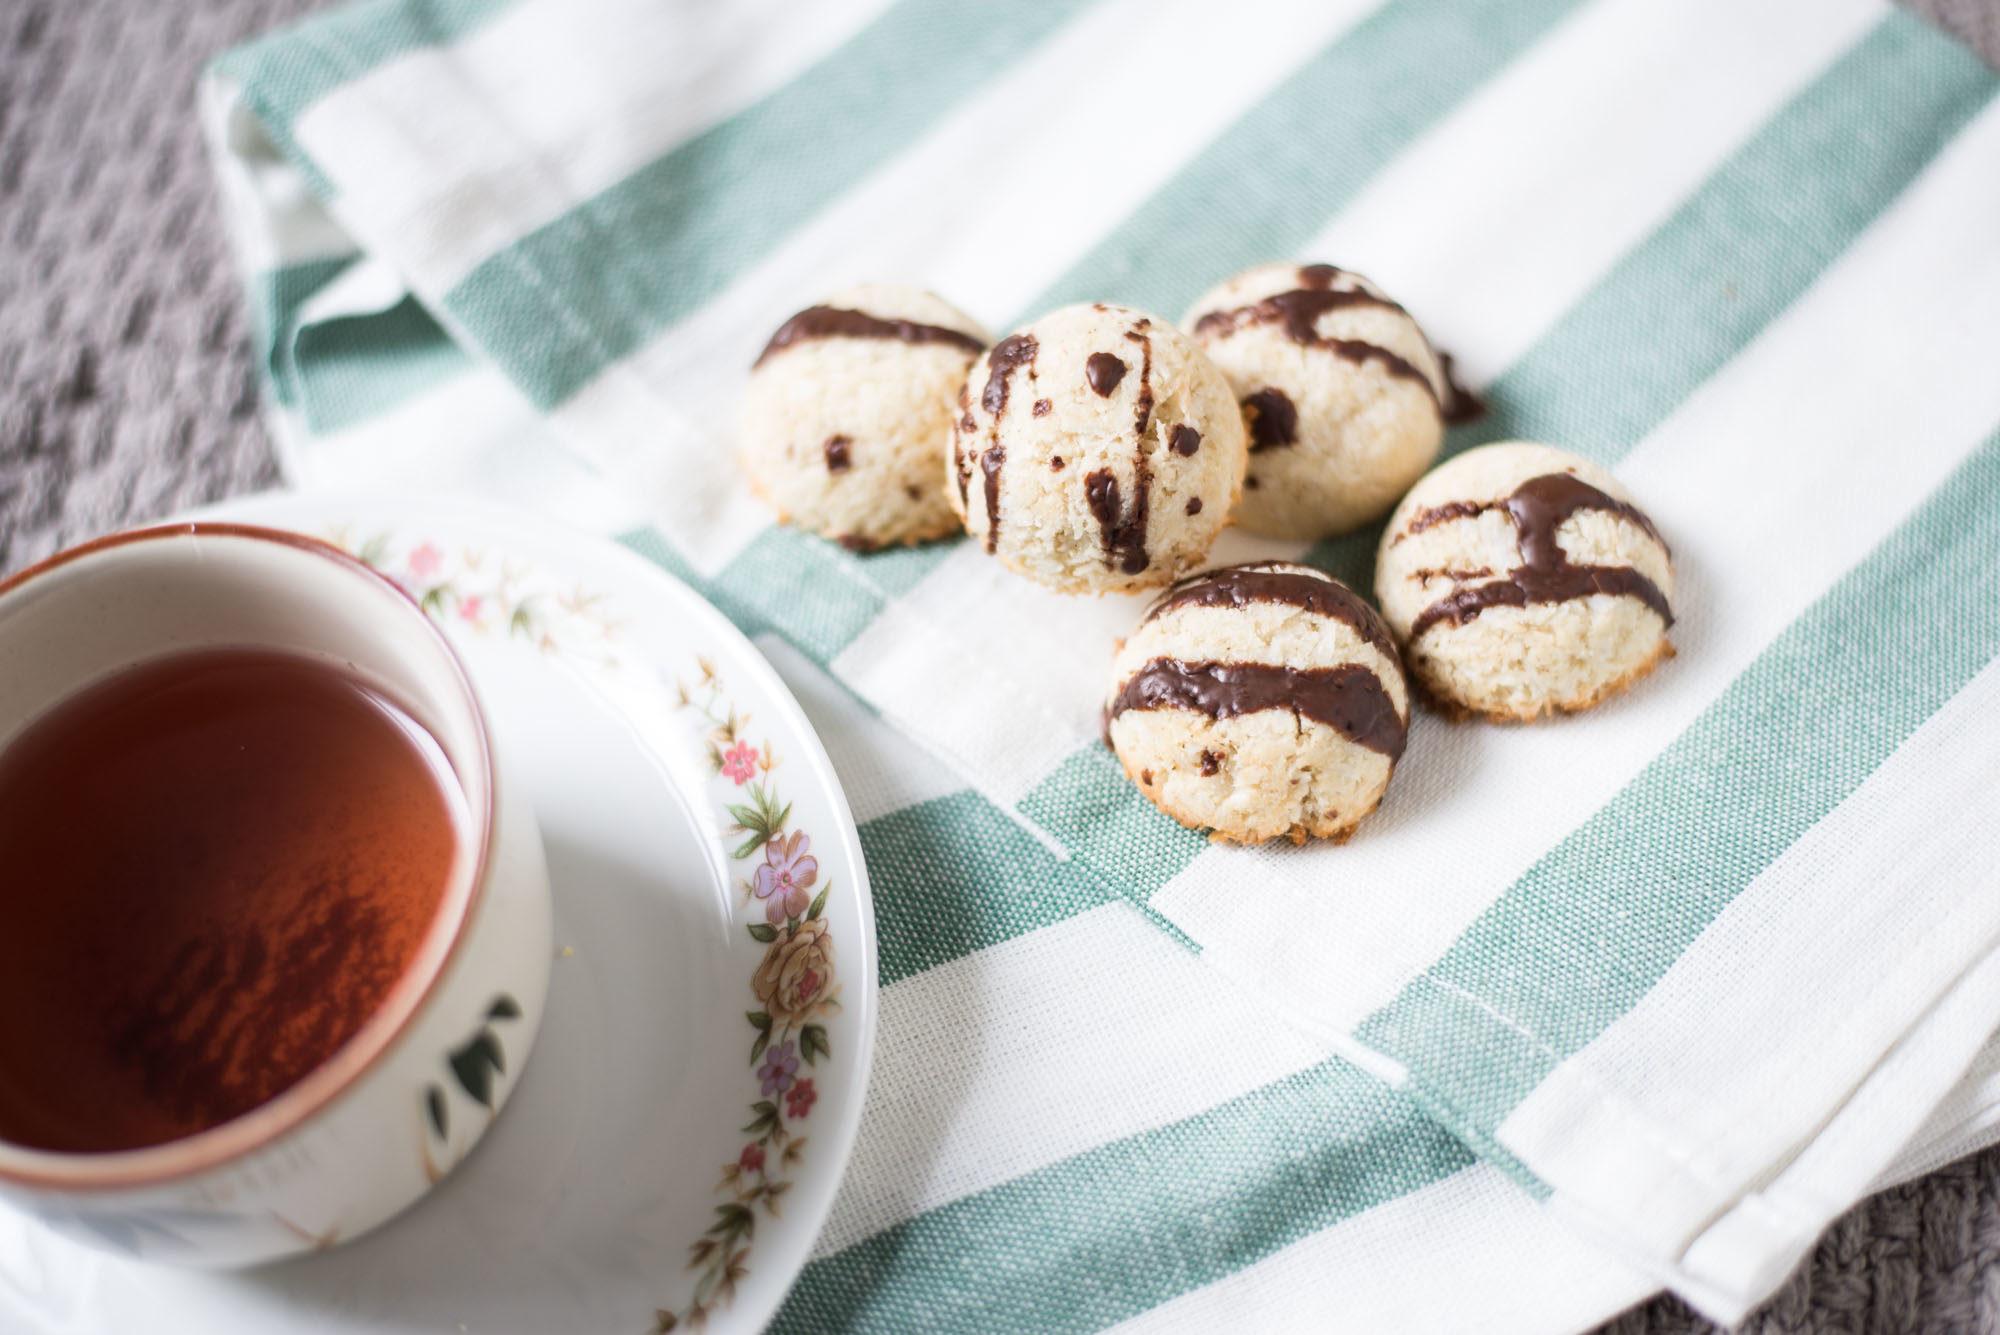 vegan gluten-free quick coconut kisses macaroons christmas cookies graz austria vintage onlinehsop